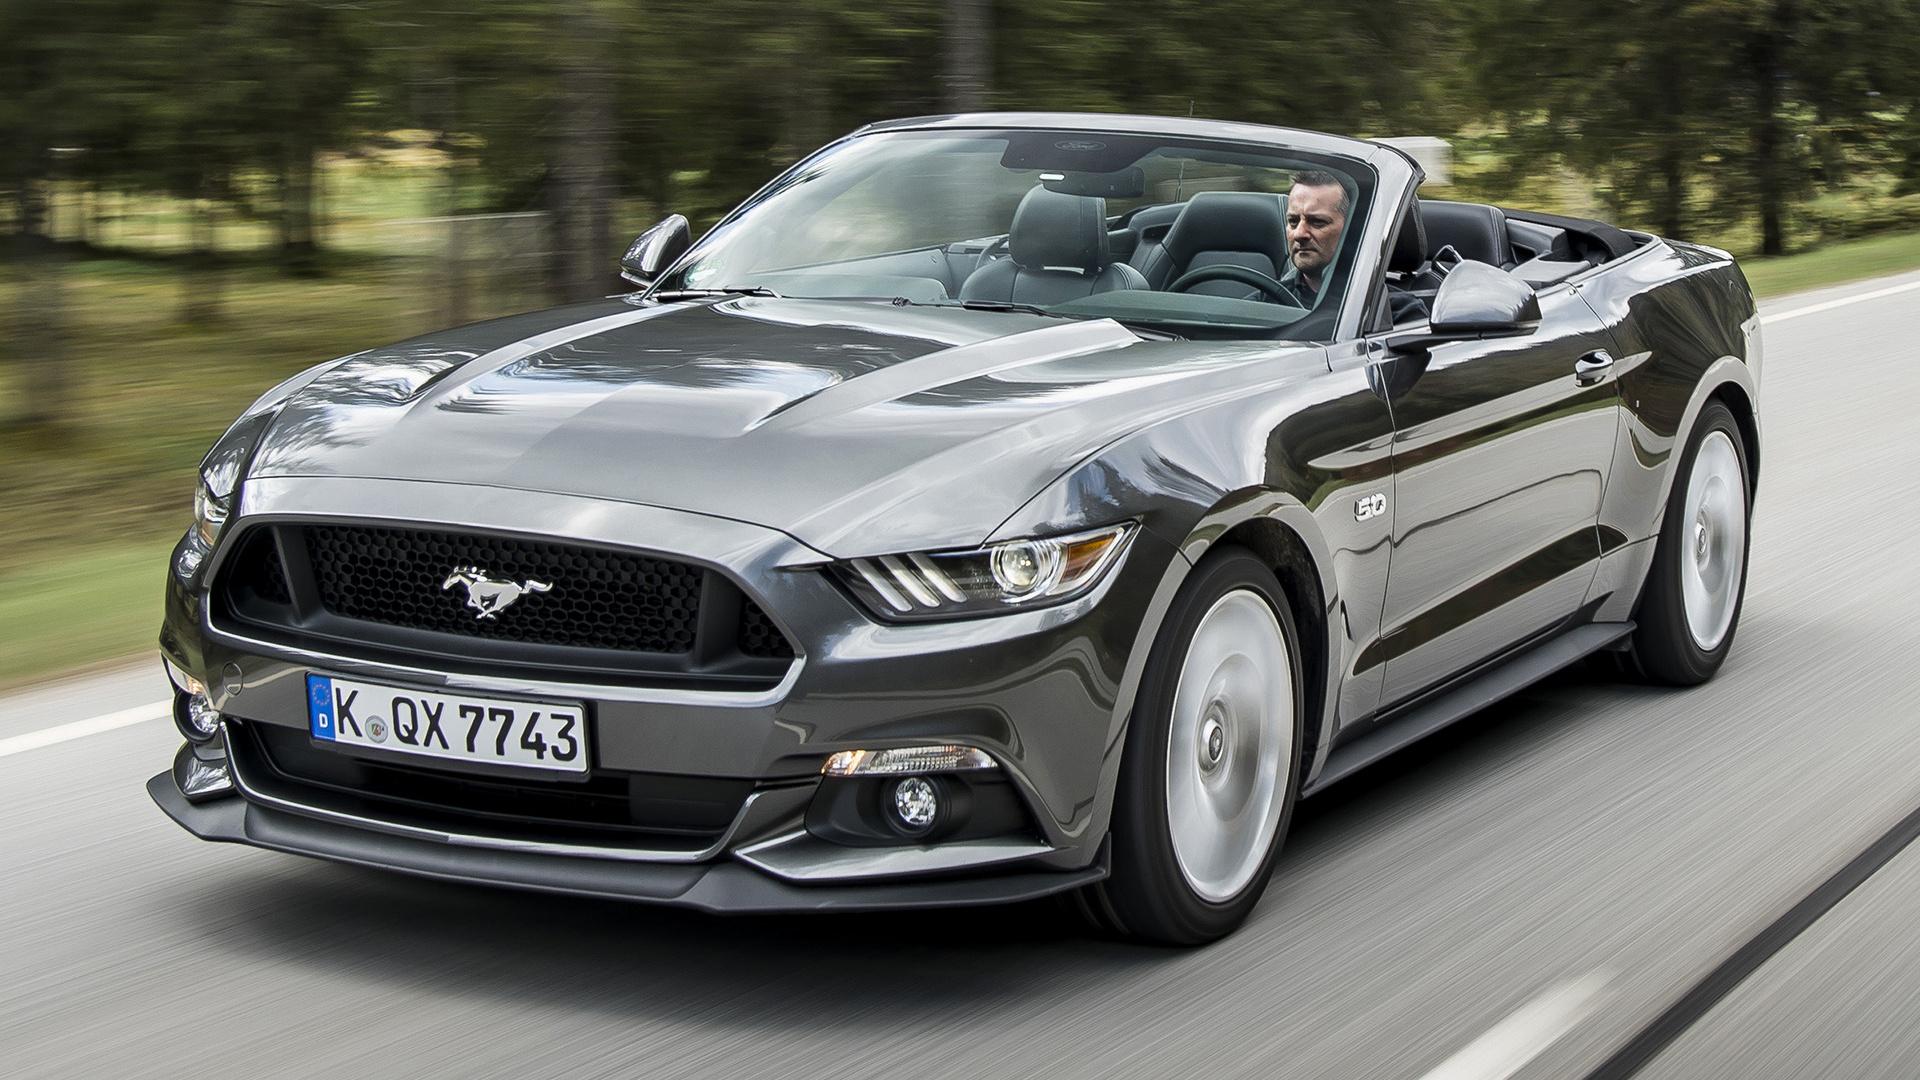 2016 Cadillac Convertible >> 2015 Ford Mustang GT Convertible (EU) - Wallpapers and HD ...